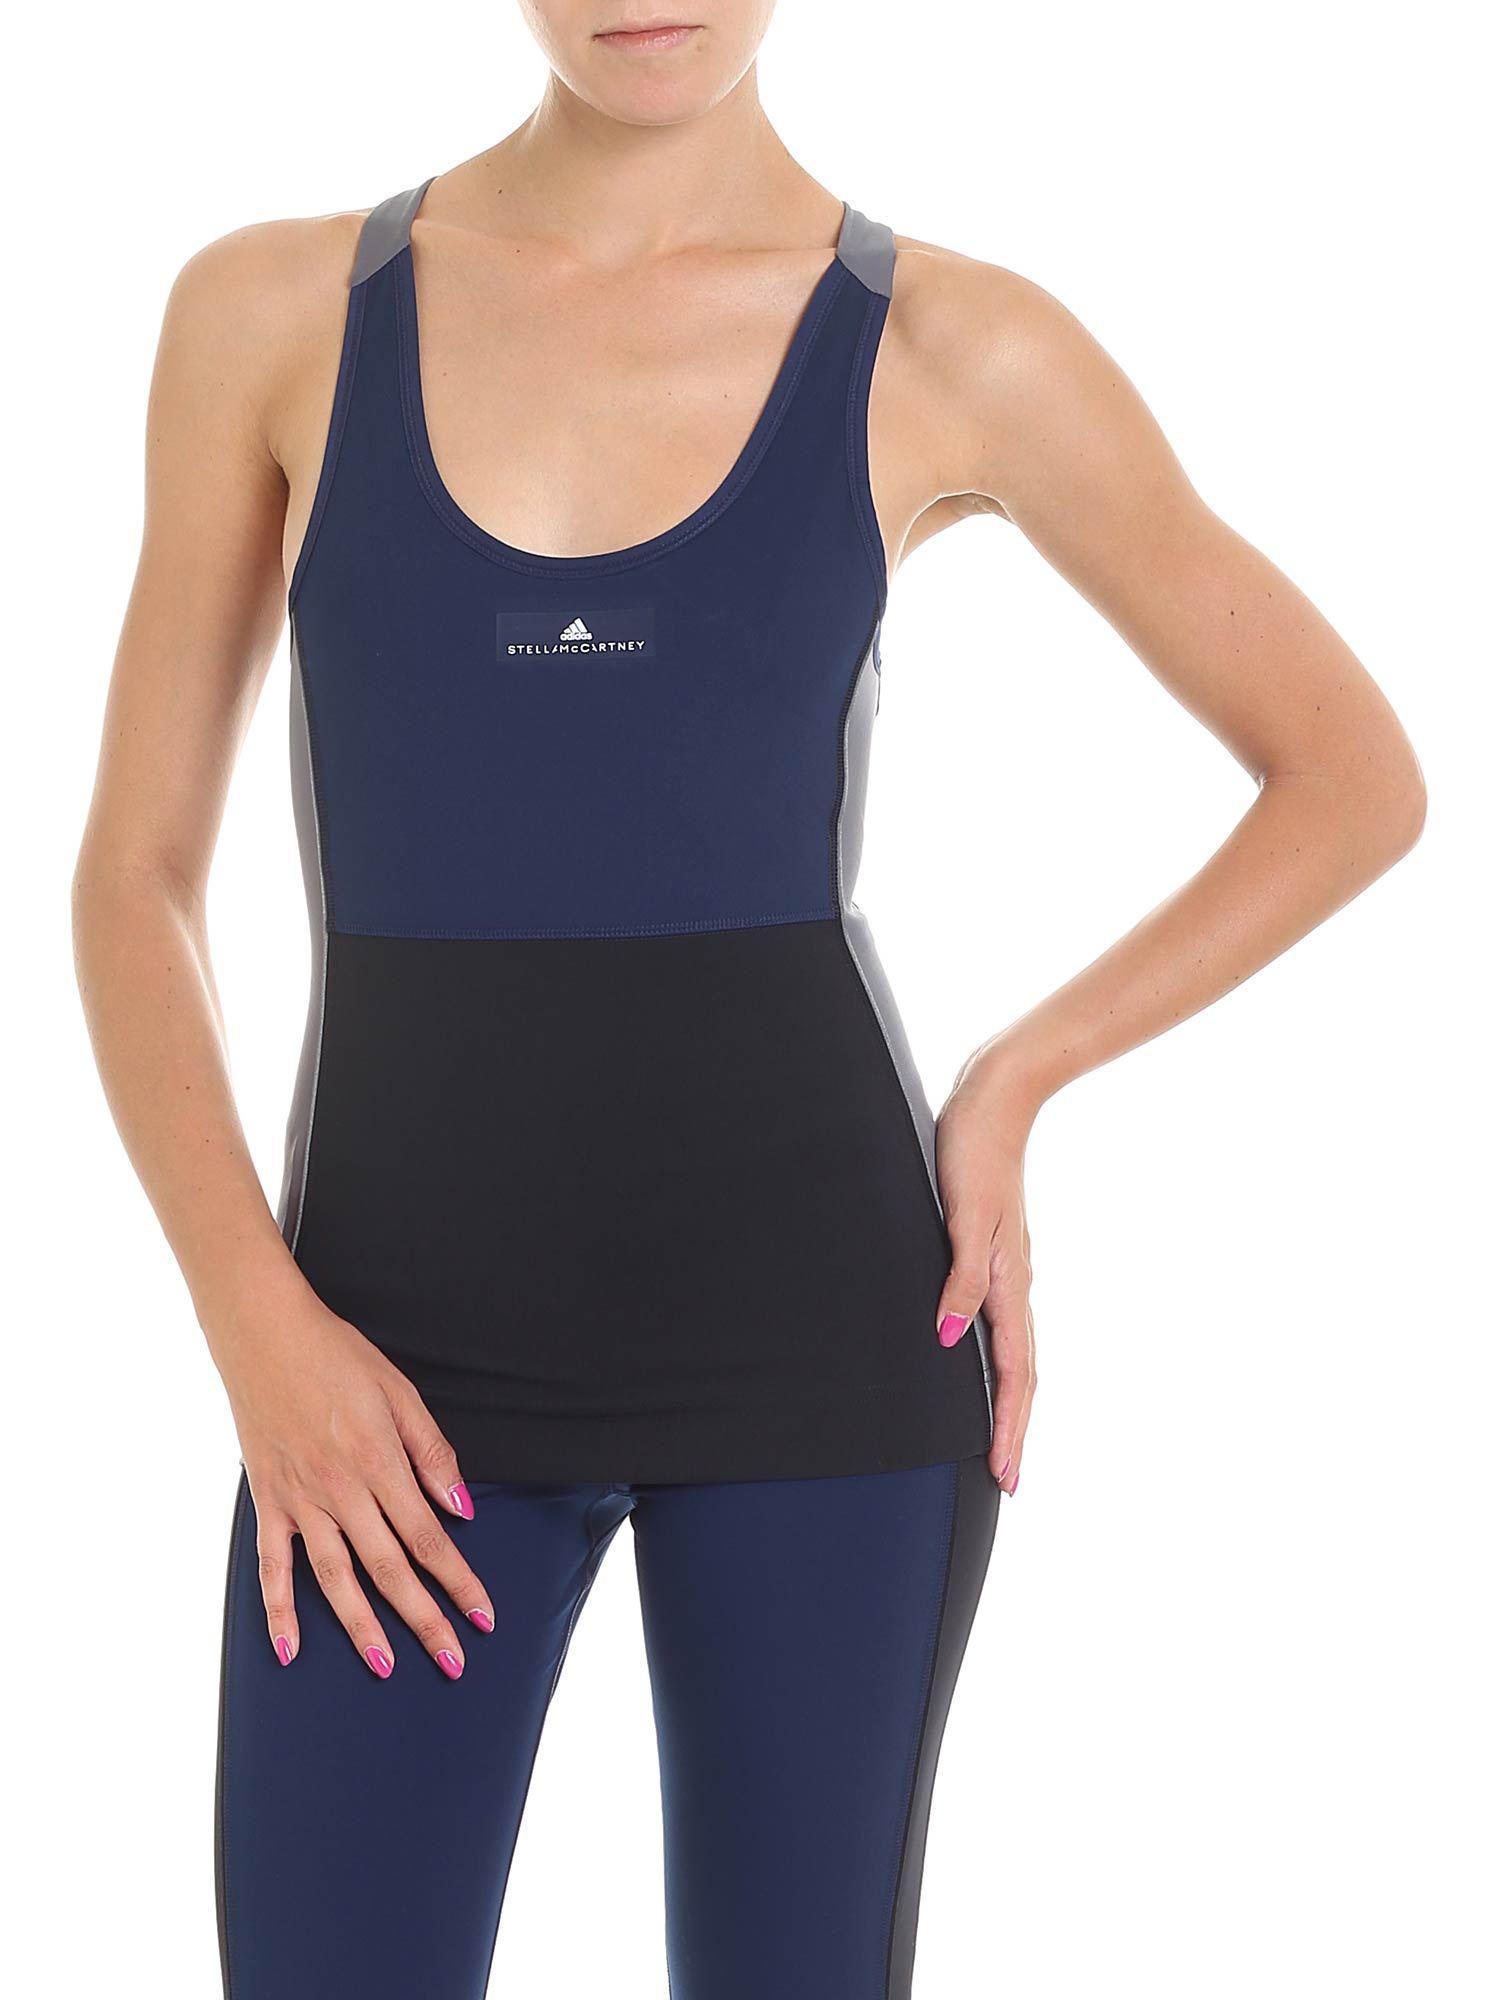 af35ee8e2a4 Lyst - adidas By Stella McCartney Yoga Comfort Top in Blue